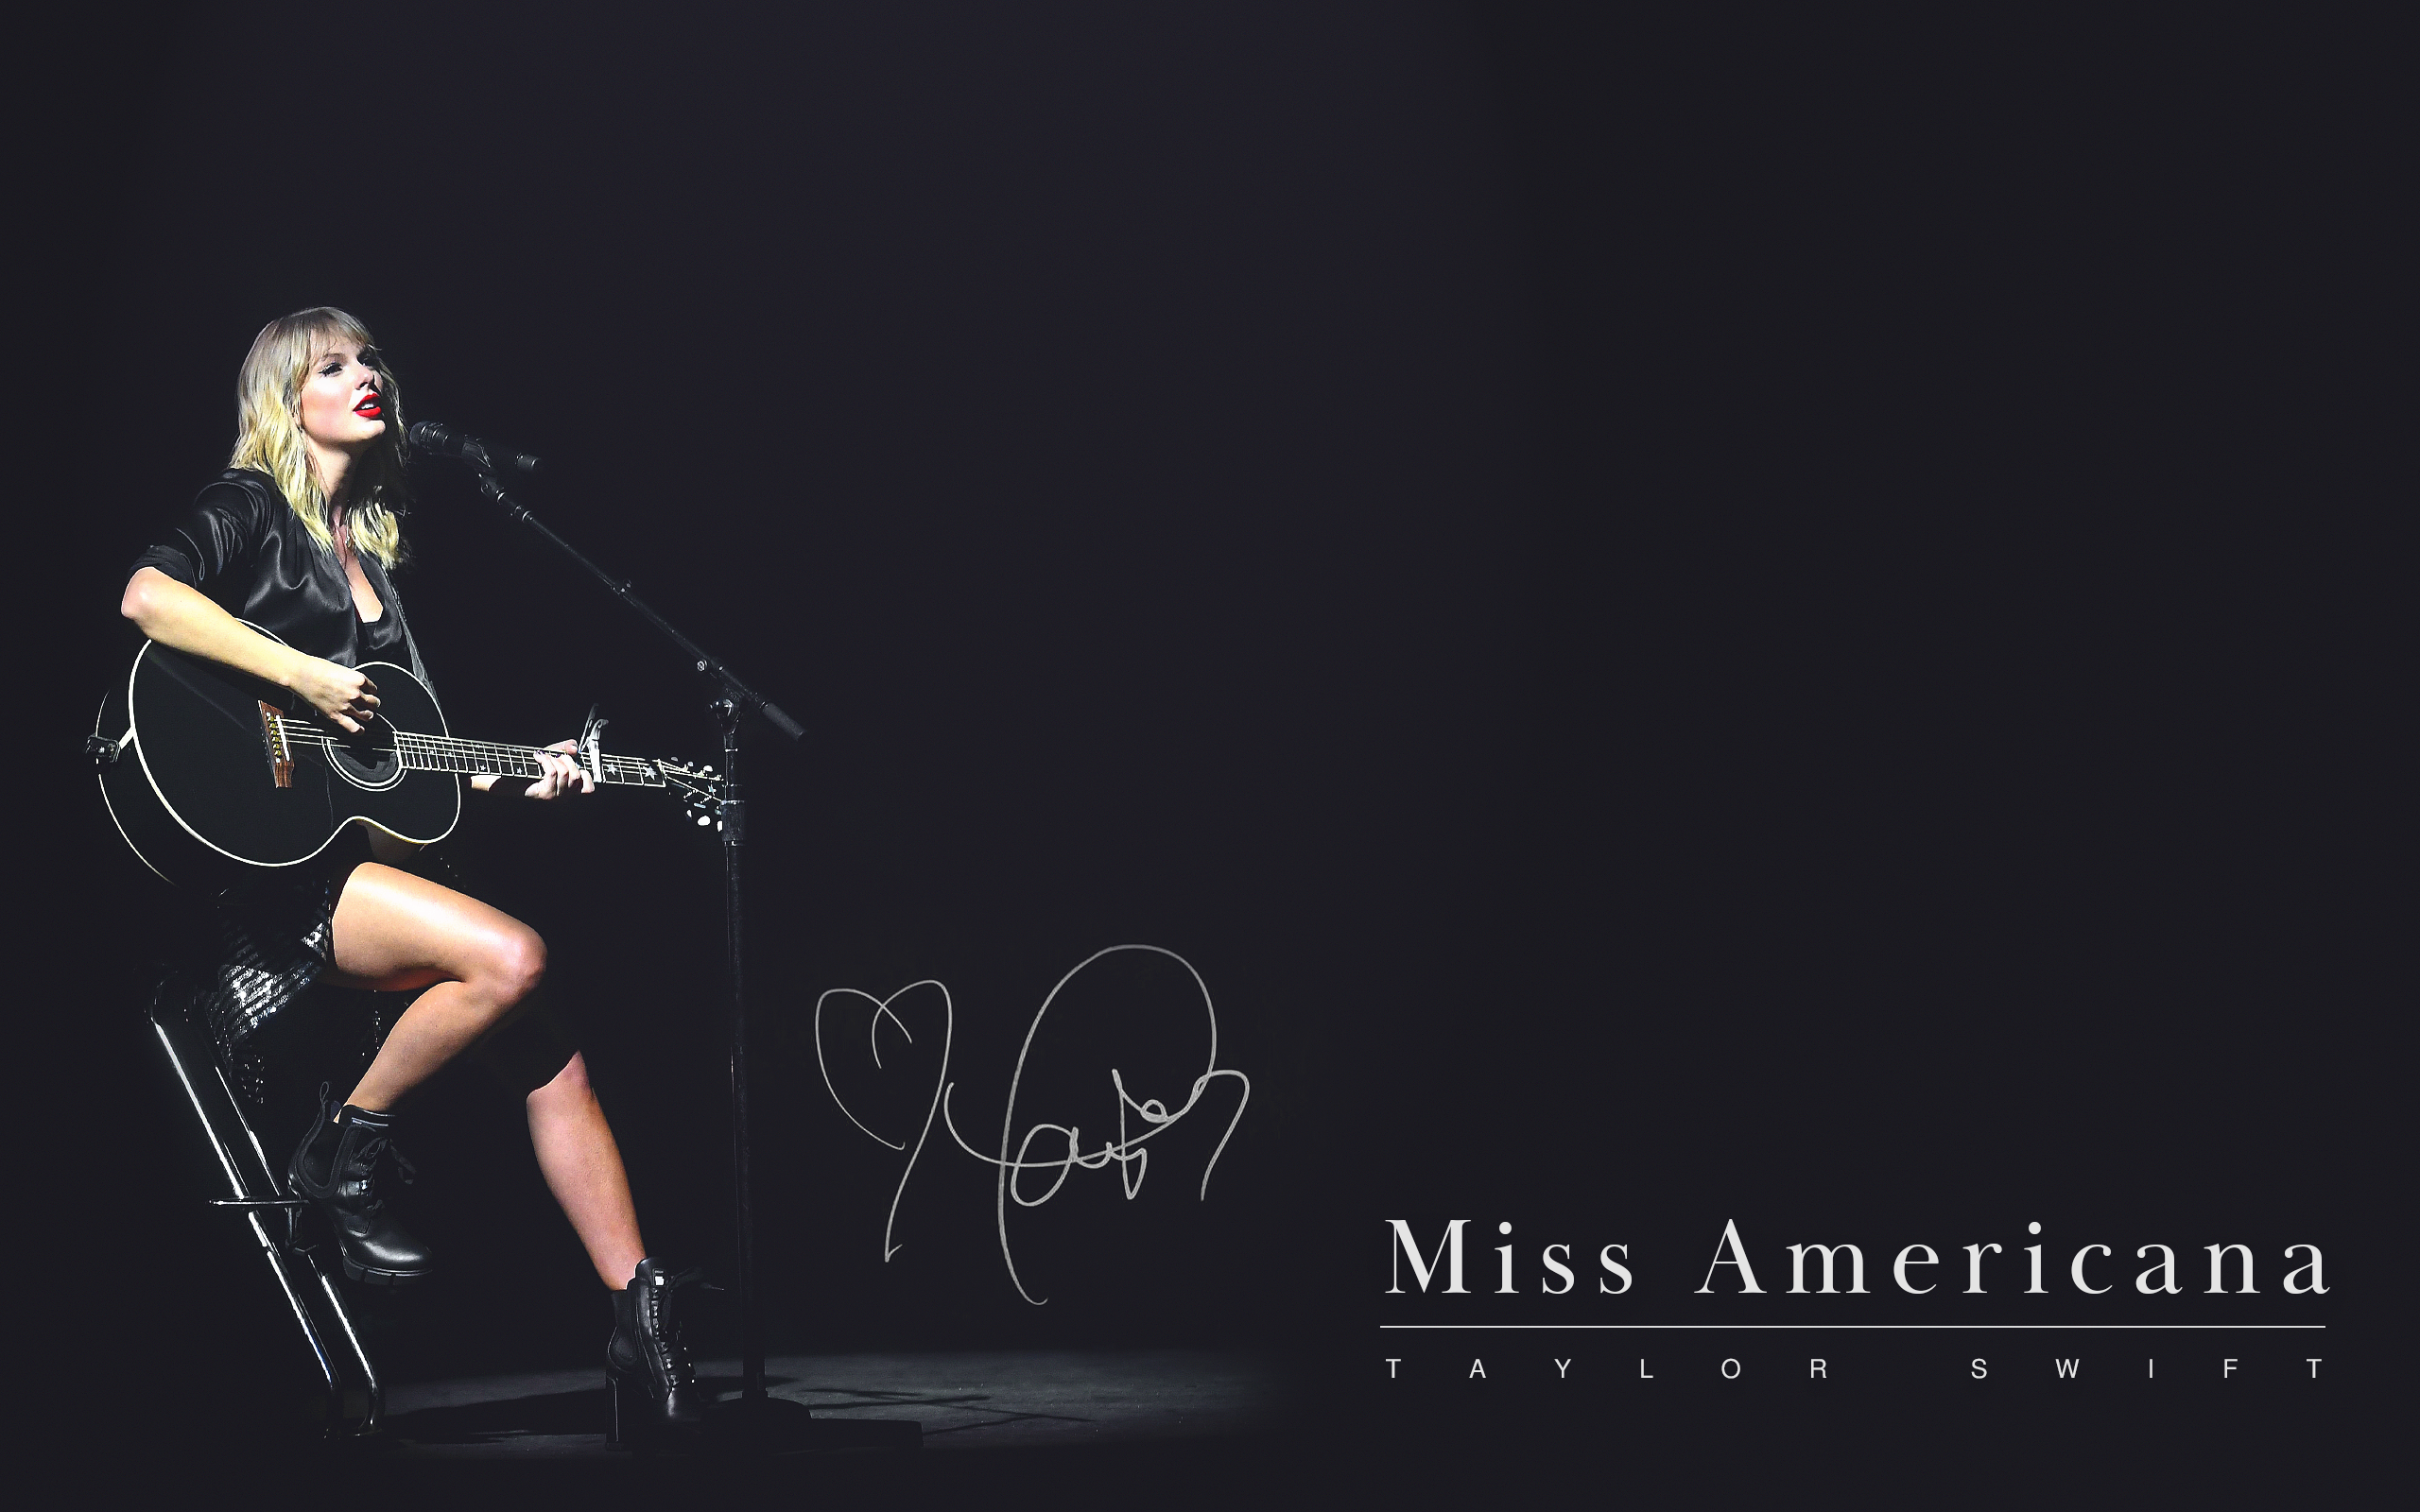 Miss Americana   desktopmobile wallpapers TaylorSwift 2560x1600